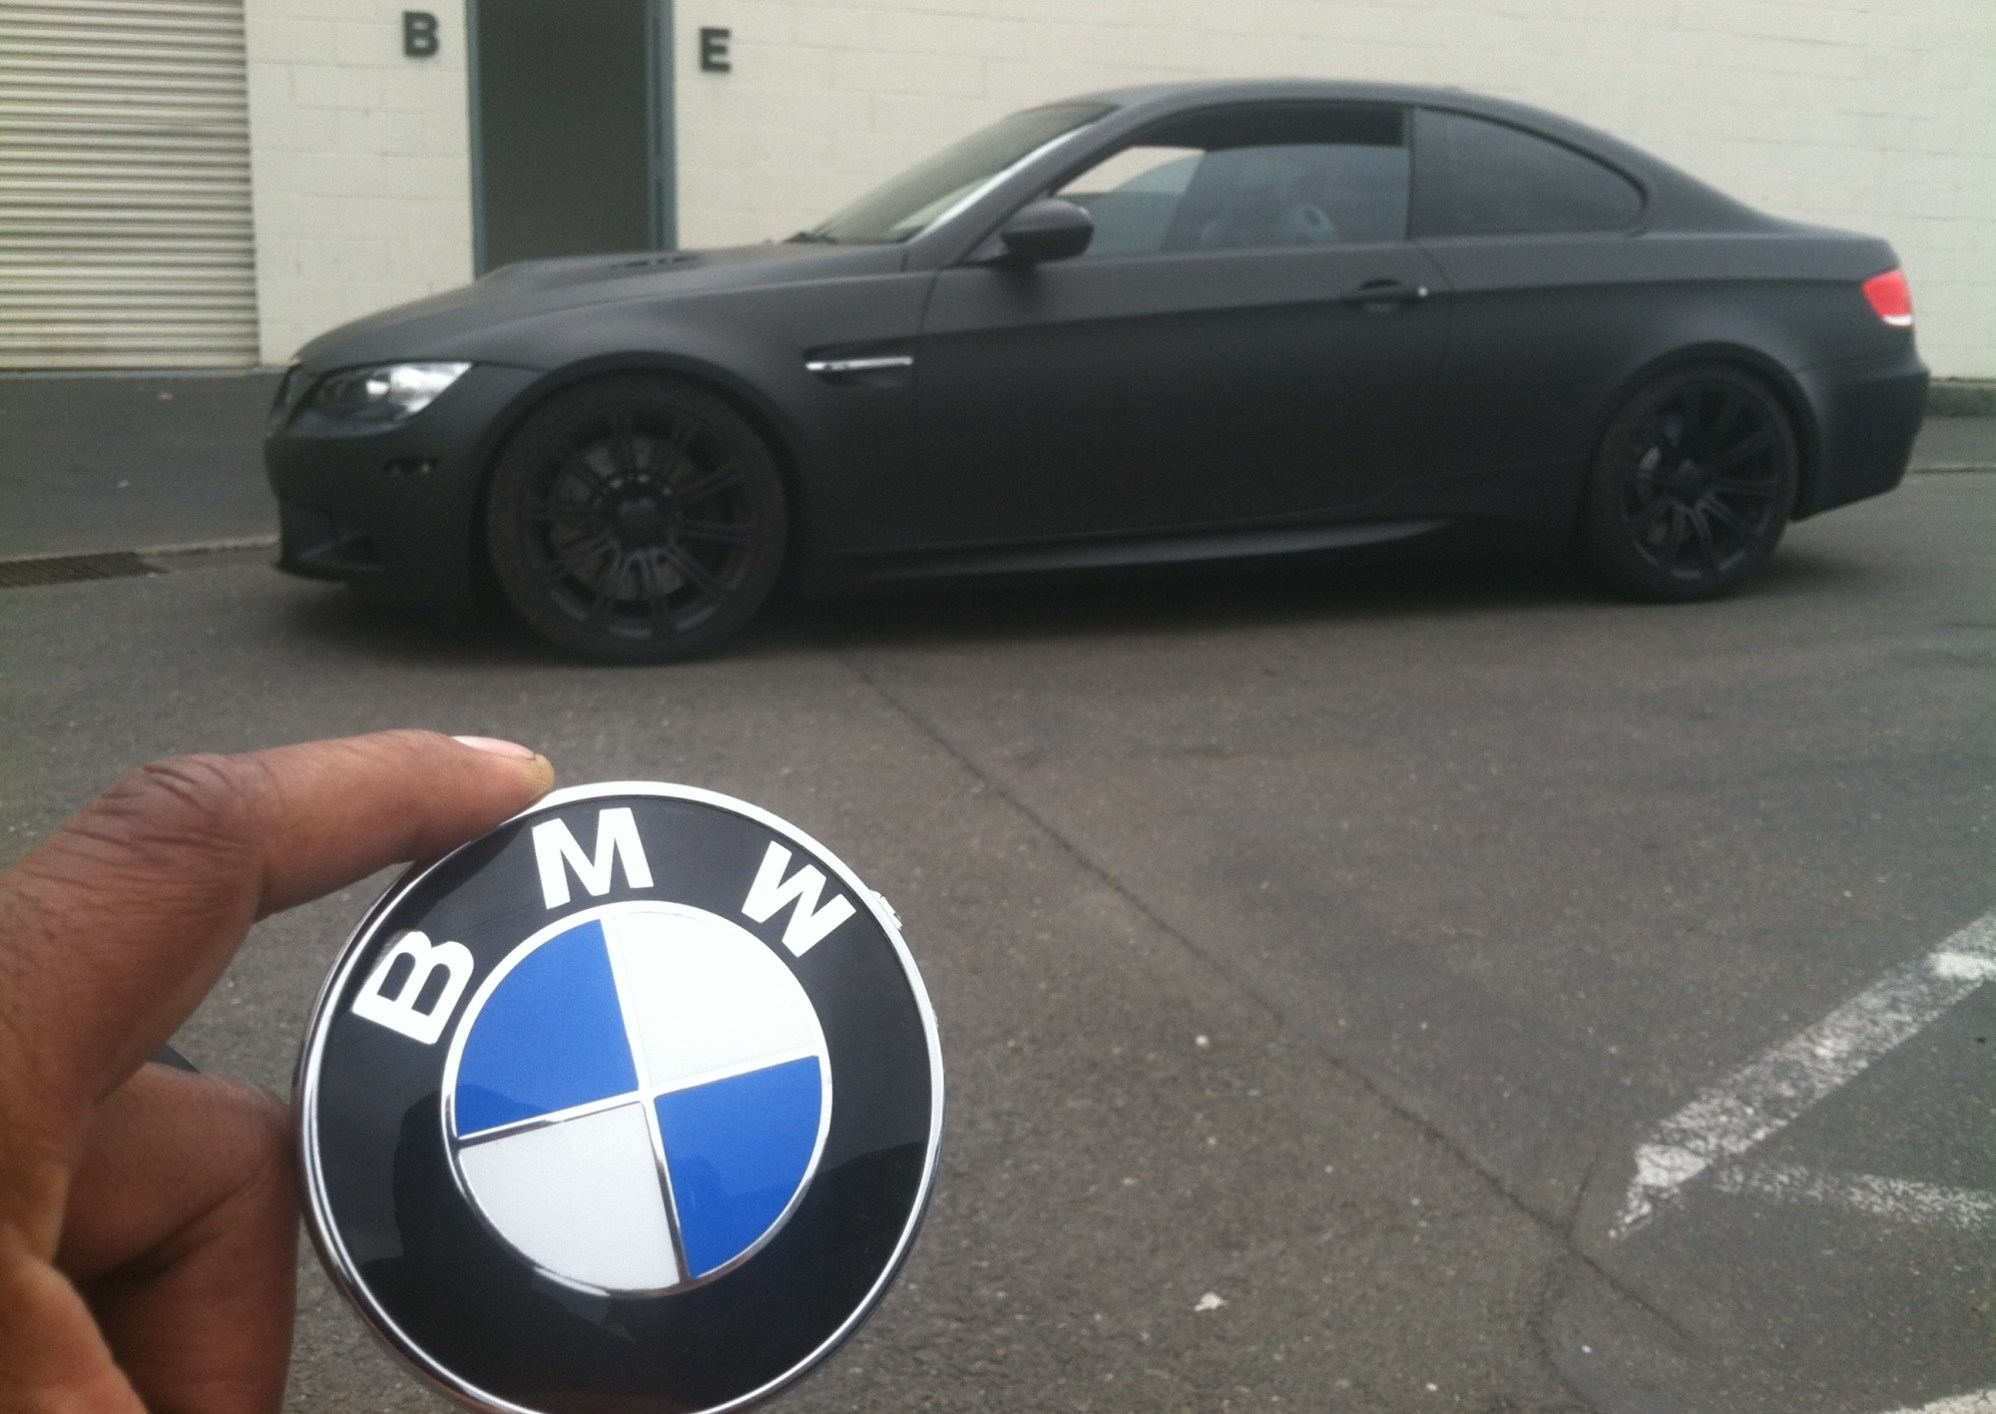 bmw color change silver to matte black-13